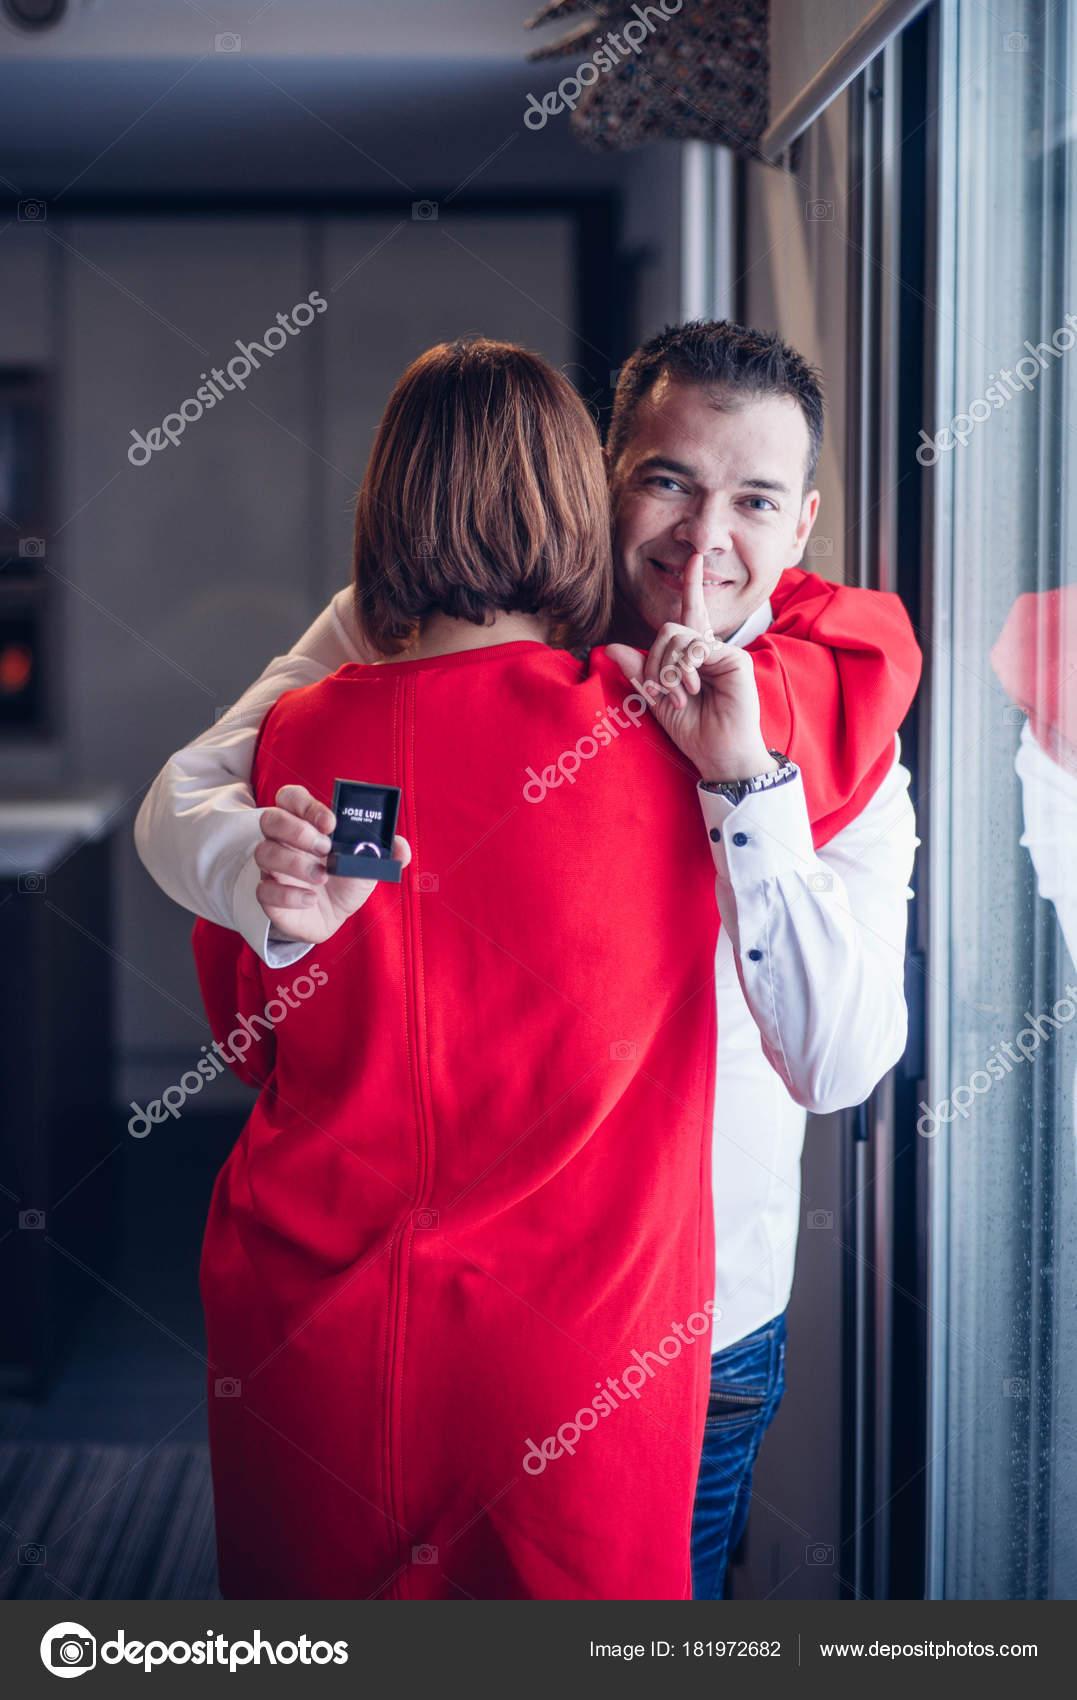 Kik dating net local